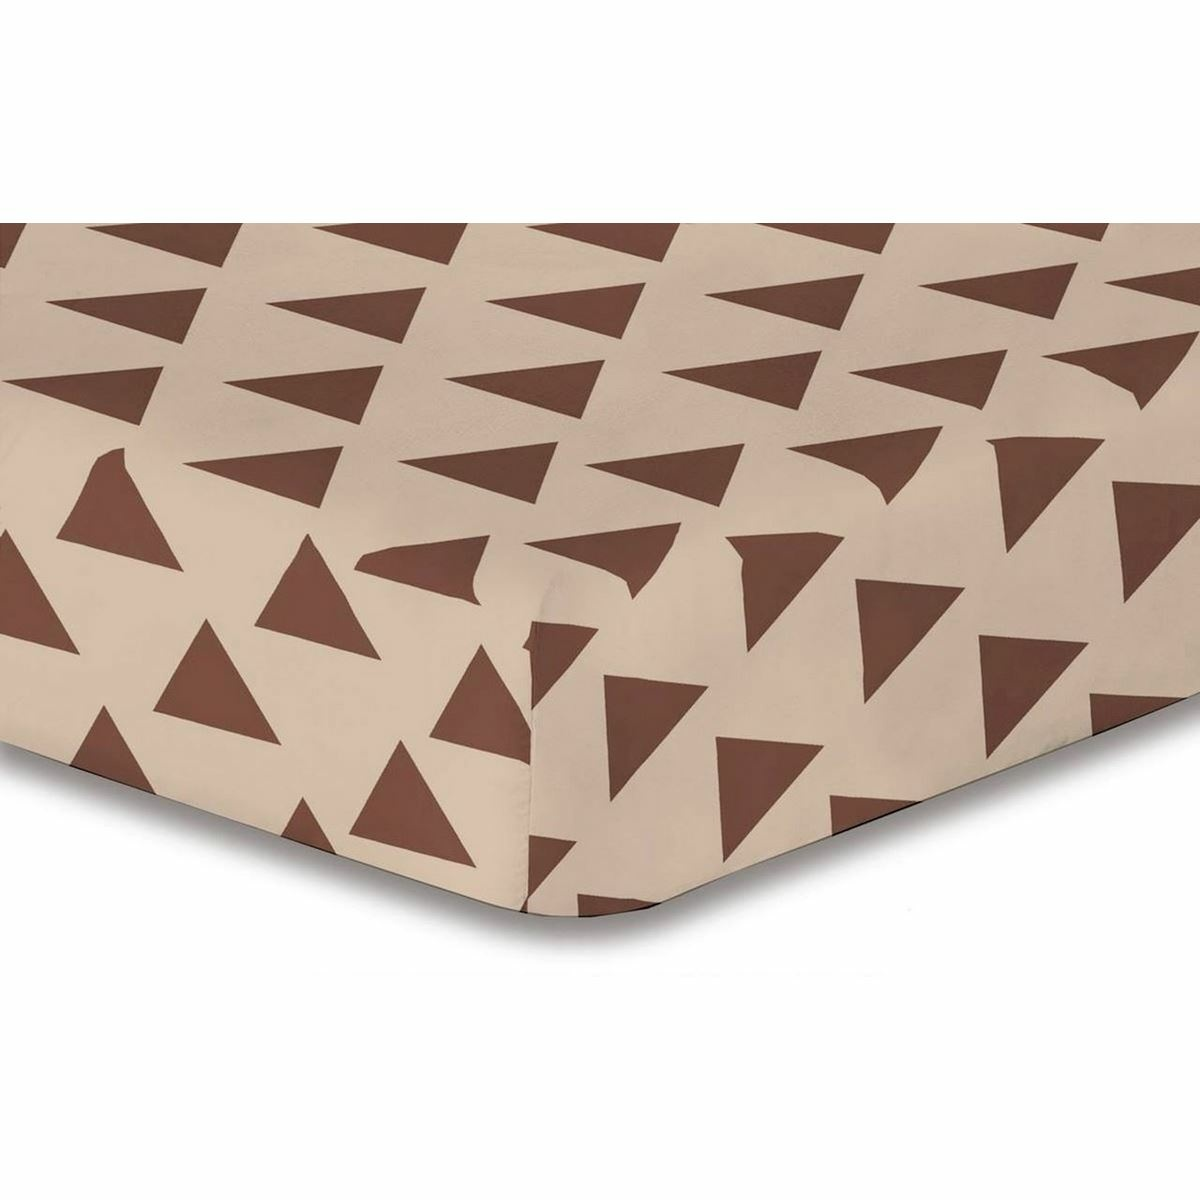 DecoKing Prostěradlo Triangles hnědá S1, 160 x 200 cm